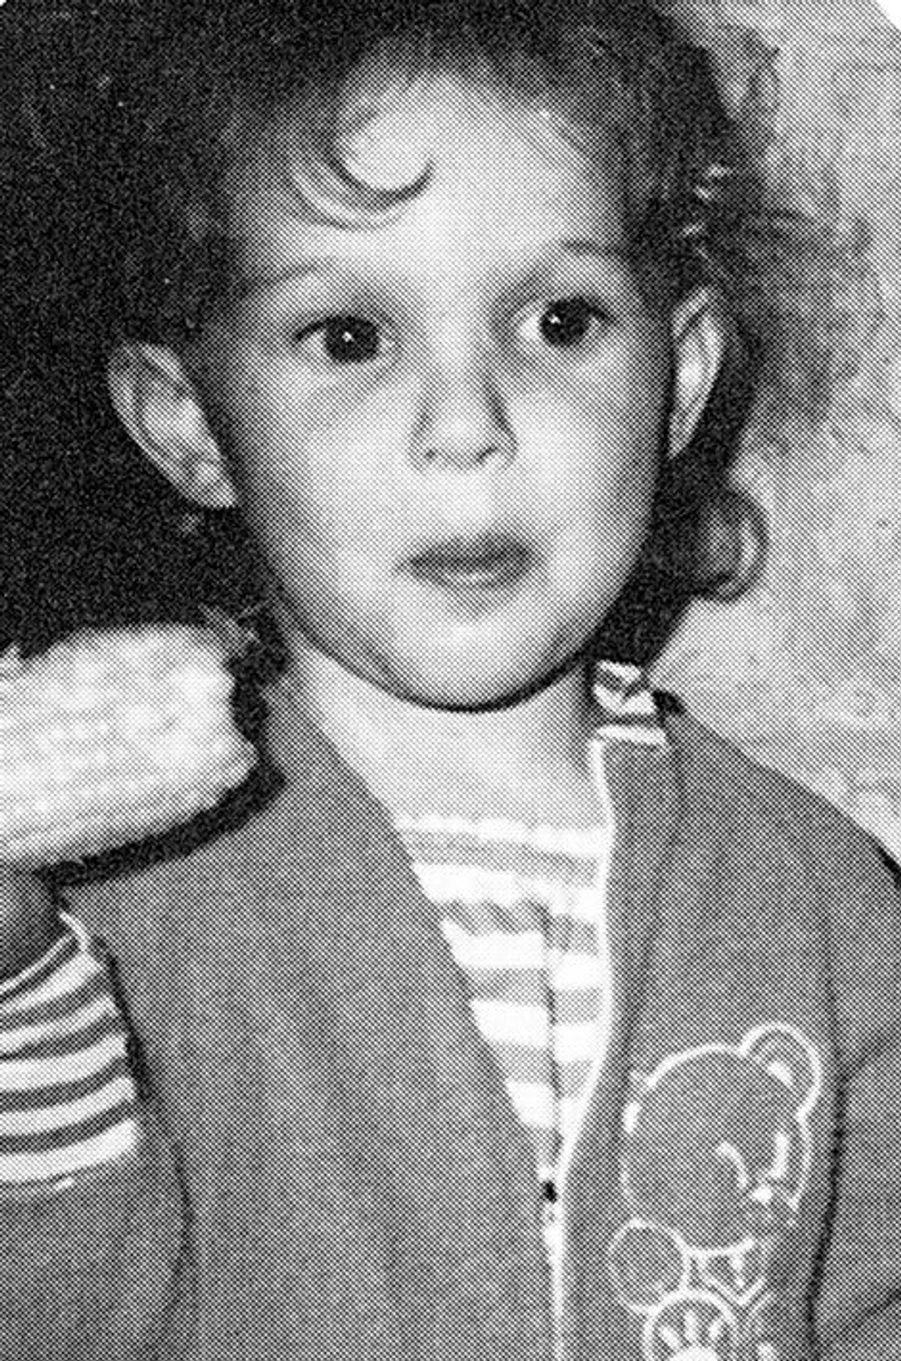 Natalie Portman enfant.